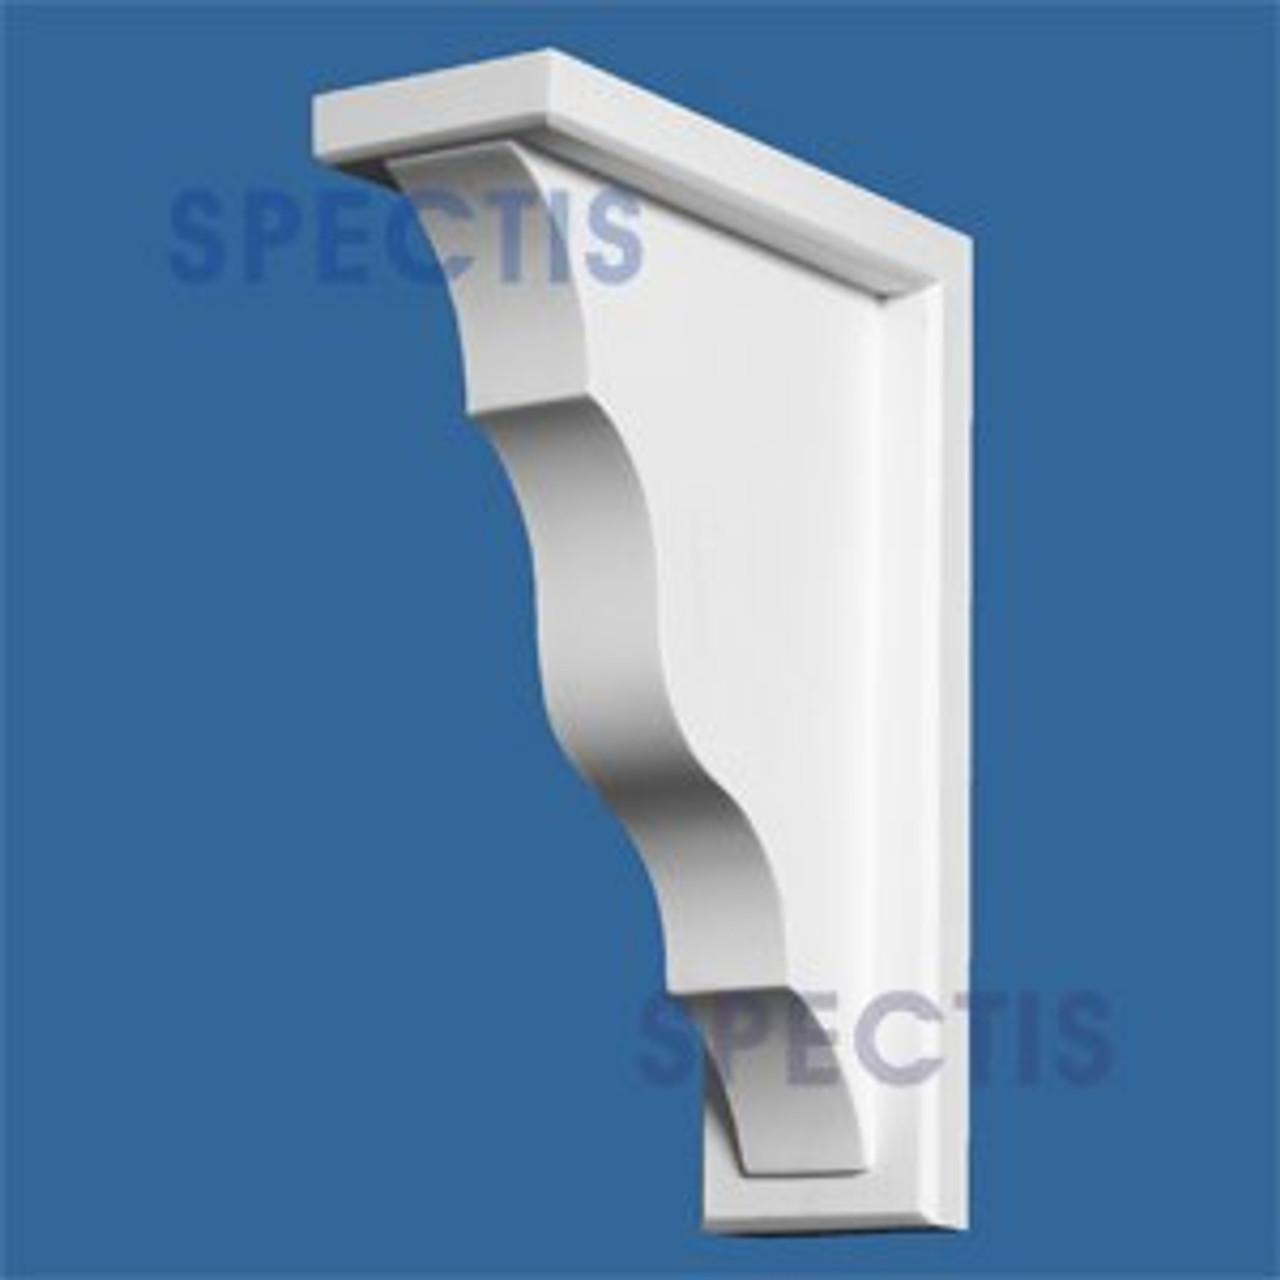 "BL2673 Corbel Block or Eave Bracket 3""W x 10.6""H x 7.5"" P"